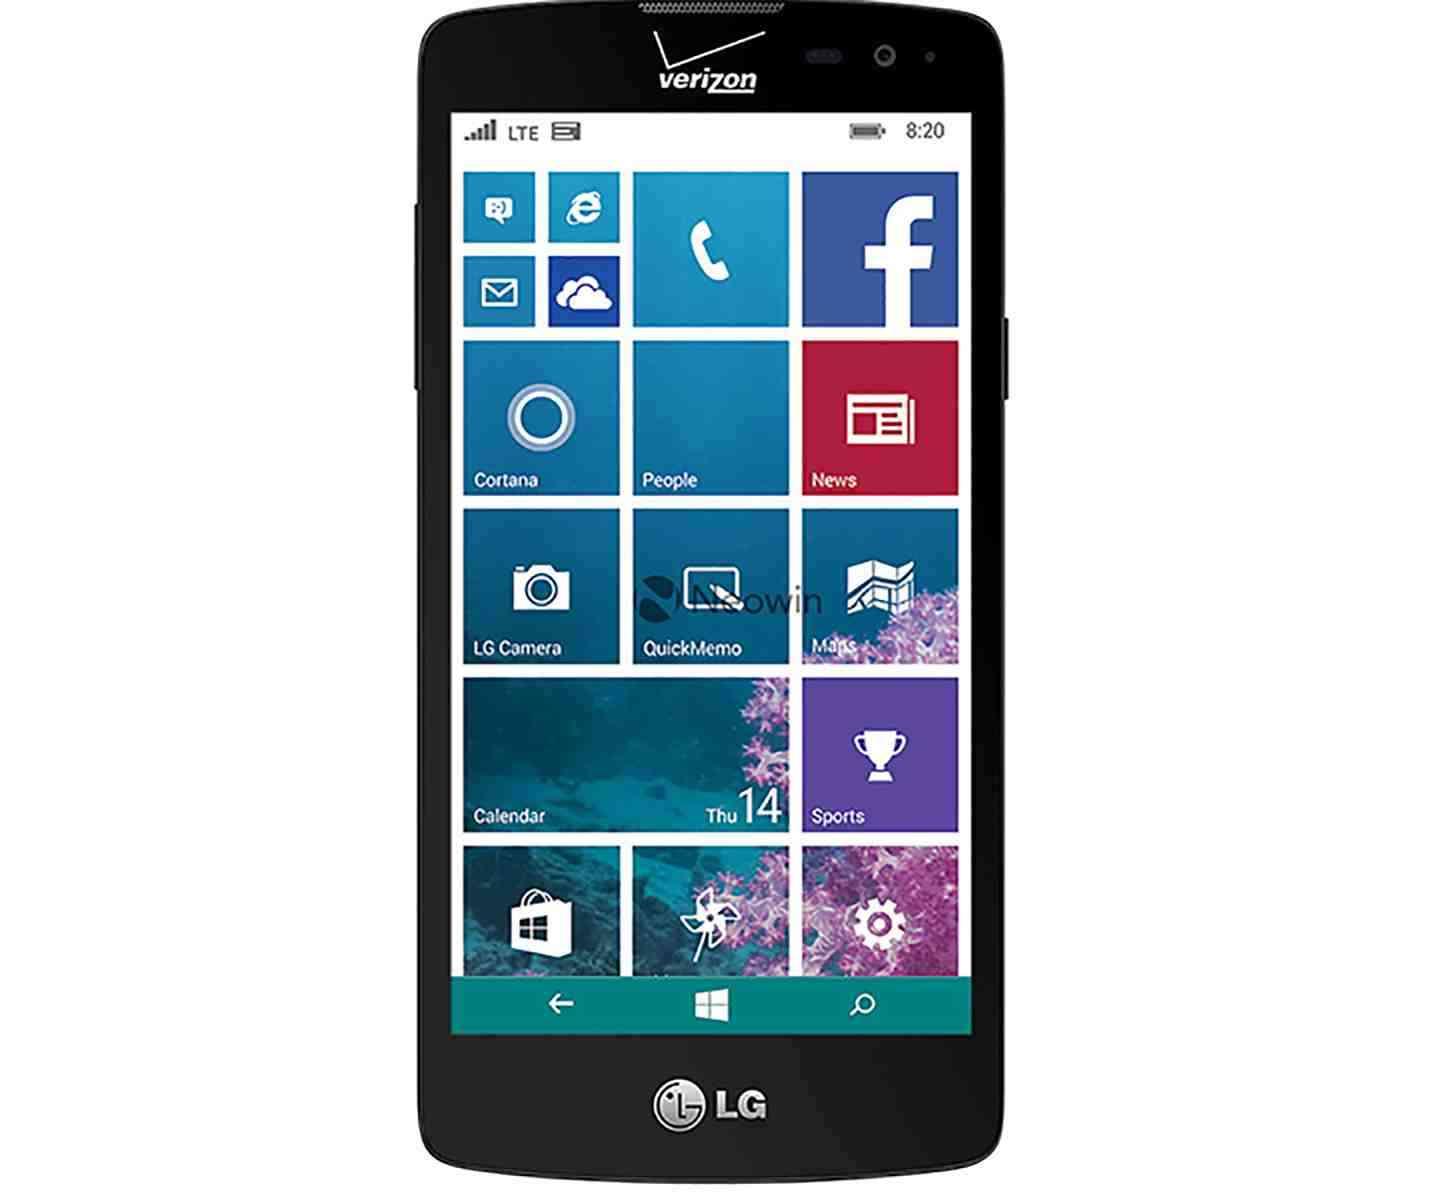 Phone Upcoming Android Phones Verizon lg lancet leak reveals specs for verizons upcoming windows phone verizon leak